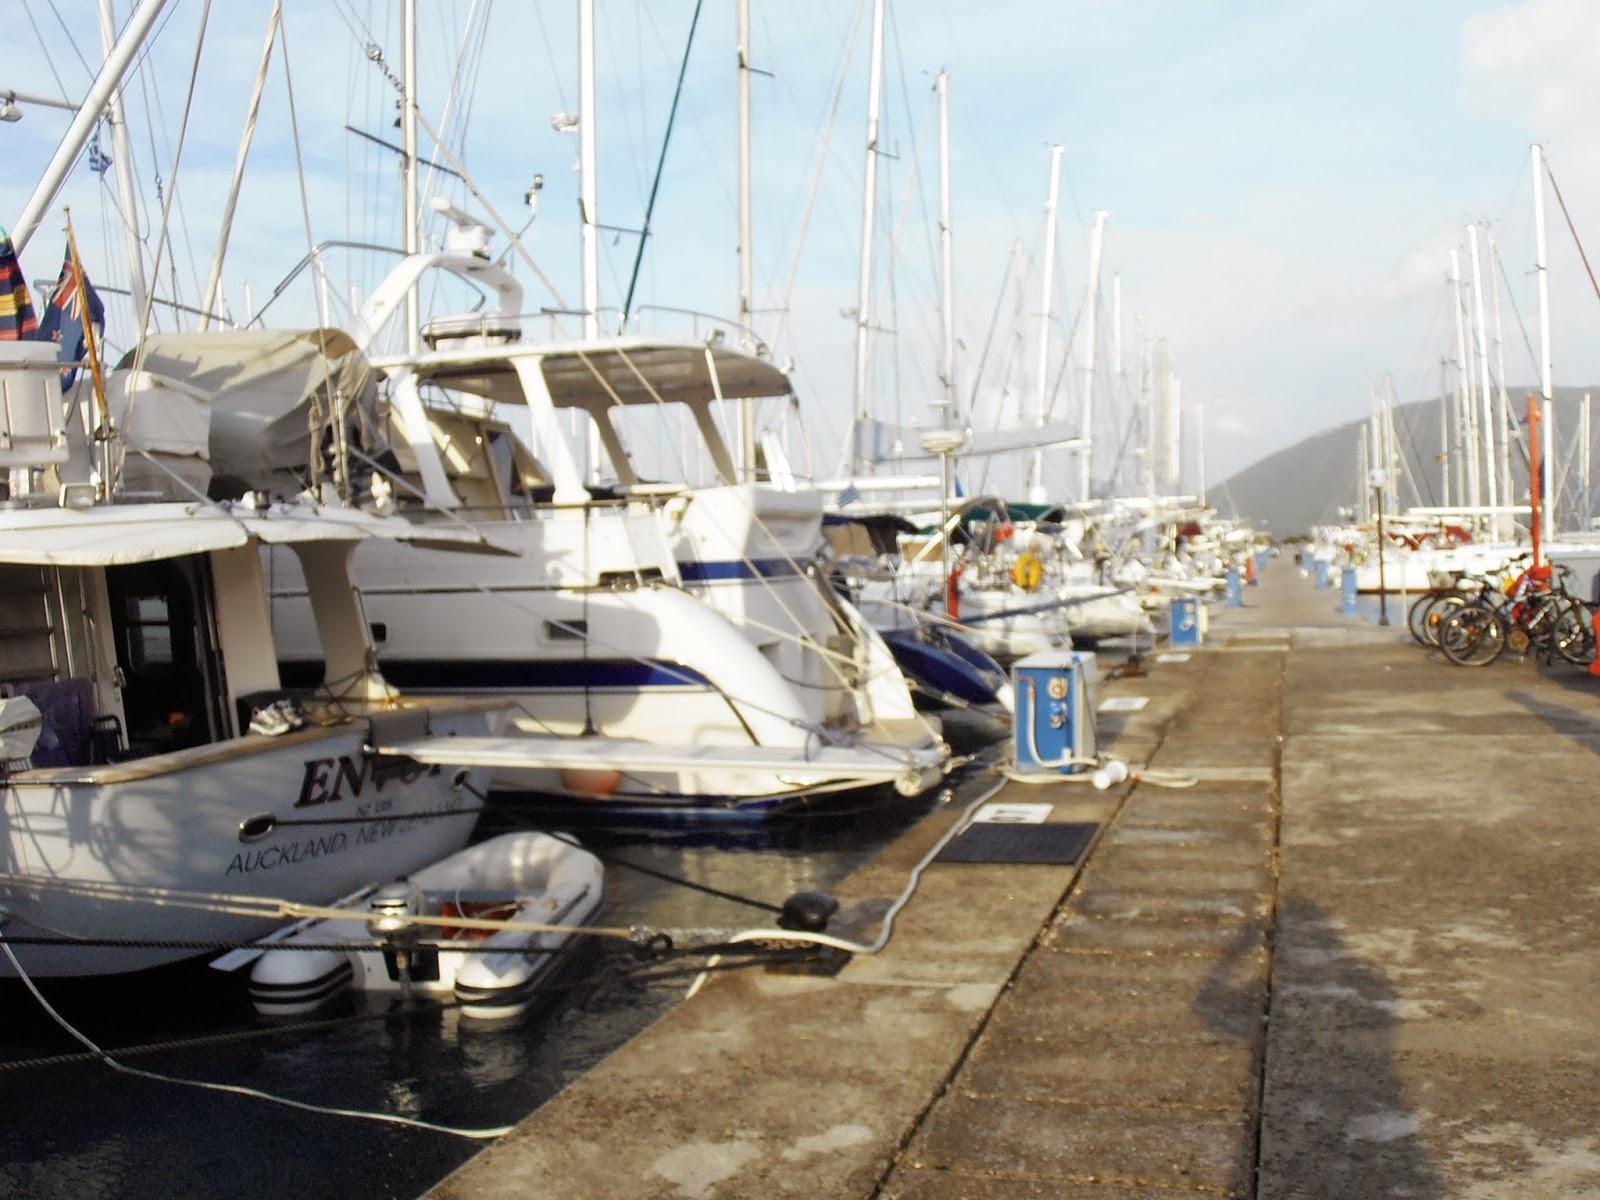 Marina in winter photo